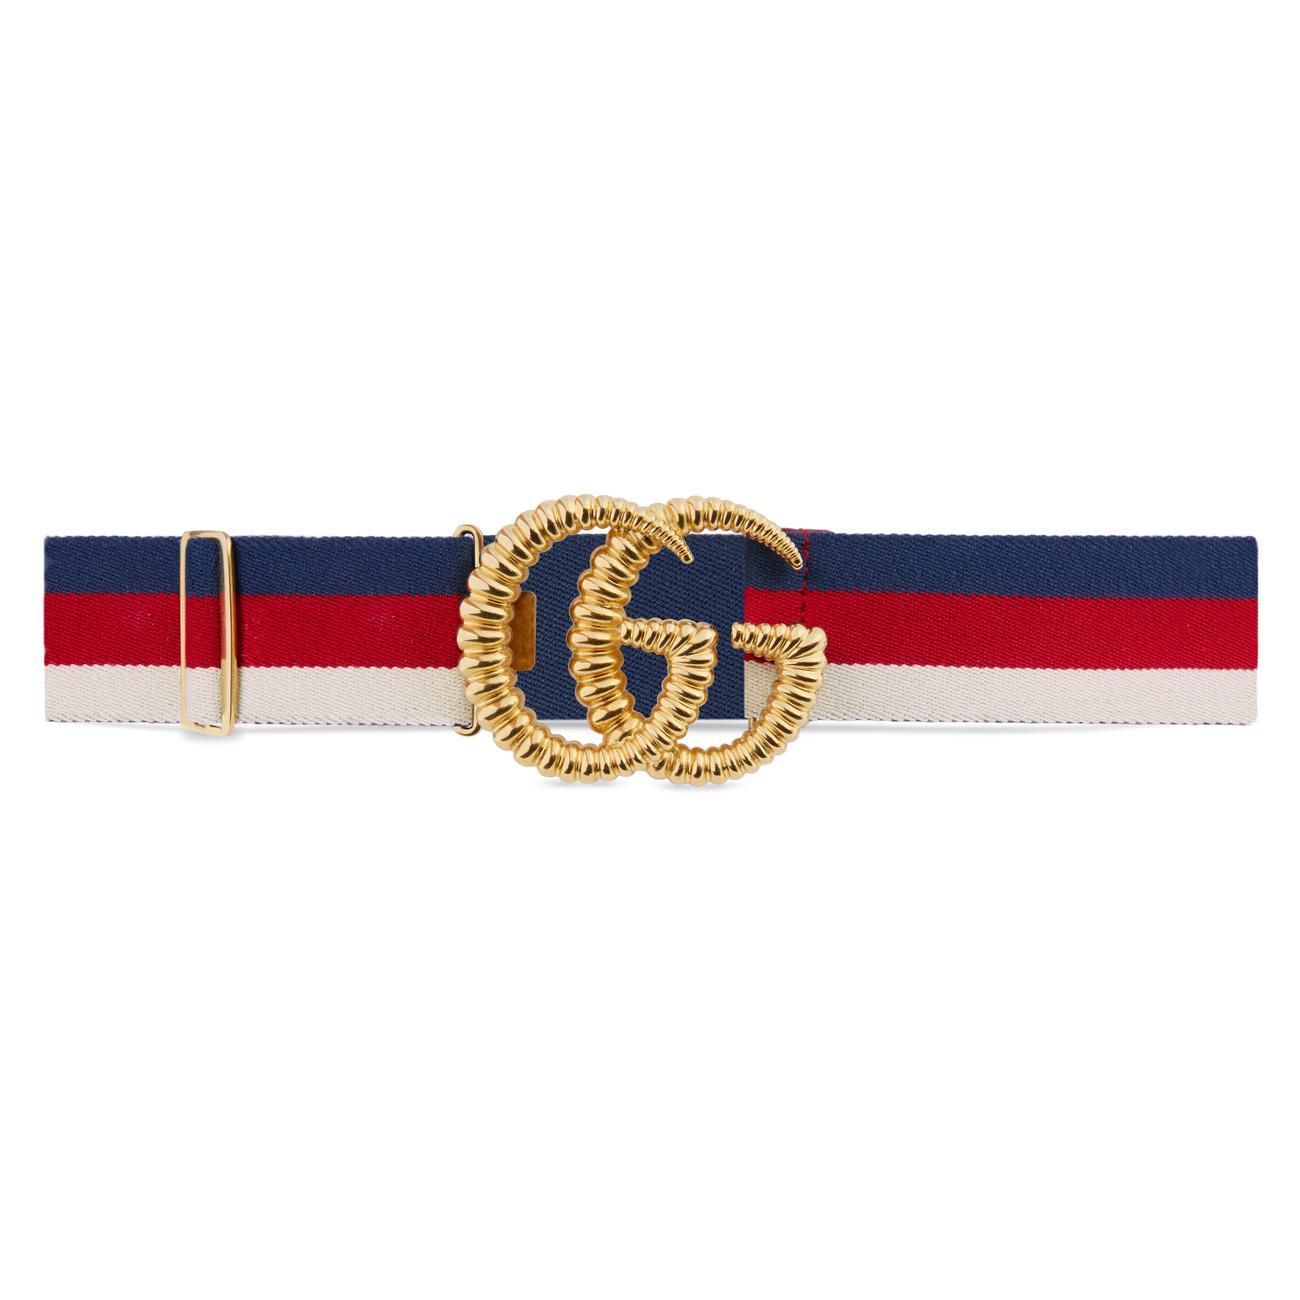 e5bb8b5e3e9 Lyst - Gucci Web Elastic Belt With Torchon Double G Buckle - Save 15%